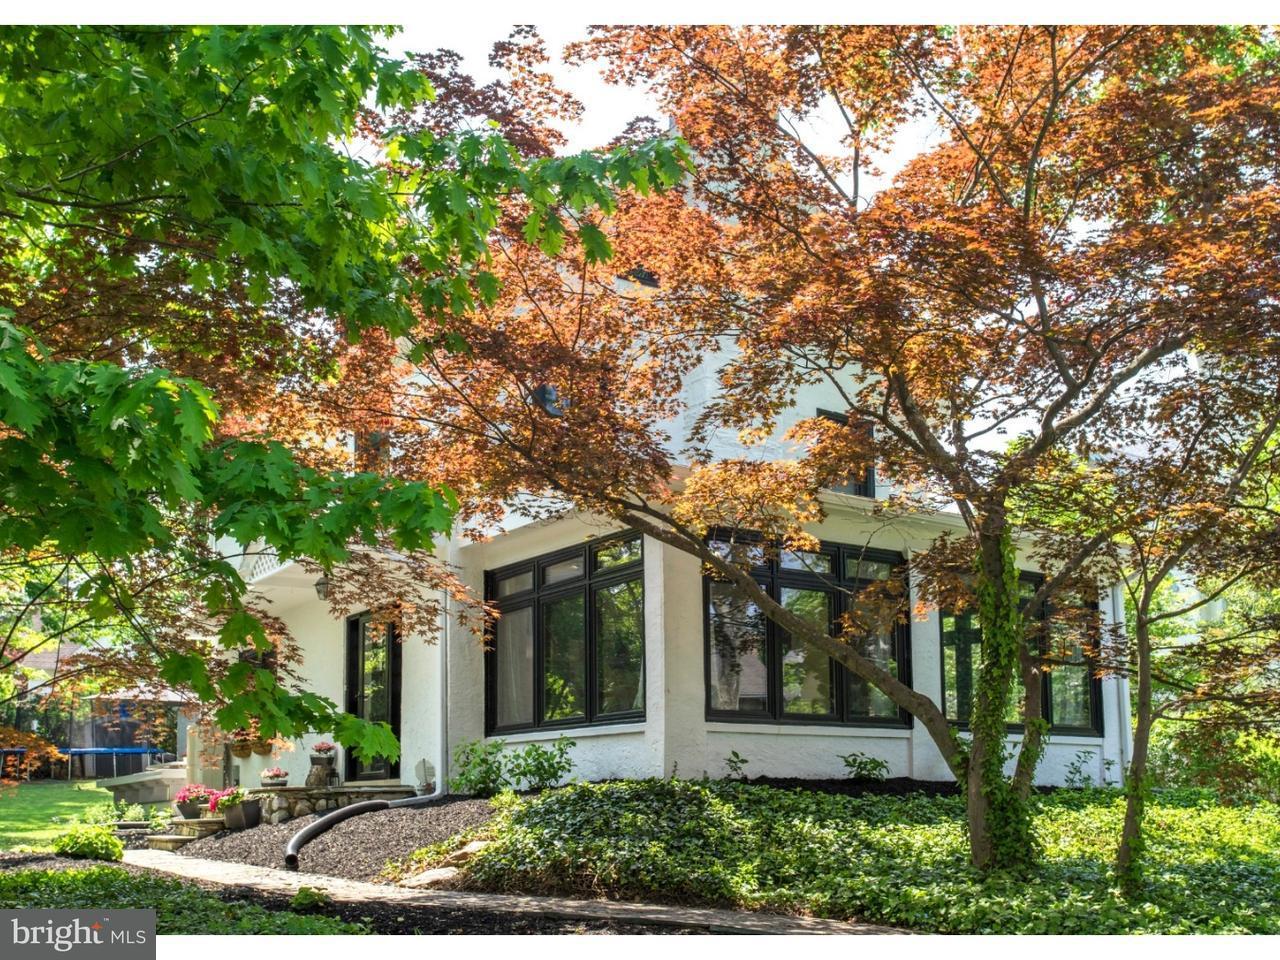 541  Manor Wynnewood, PA 19096